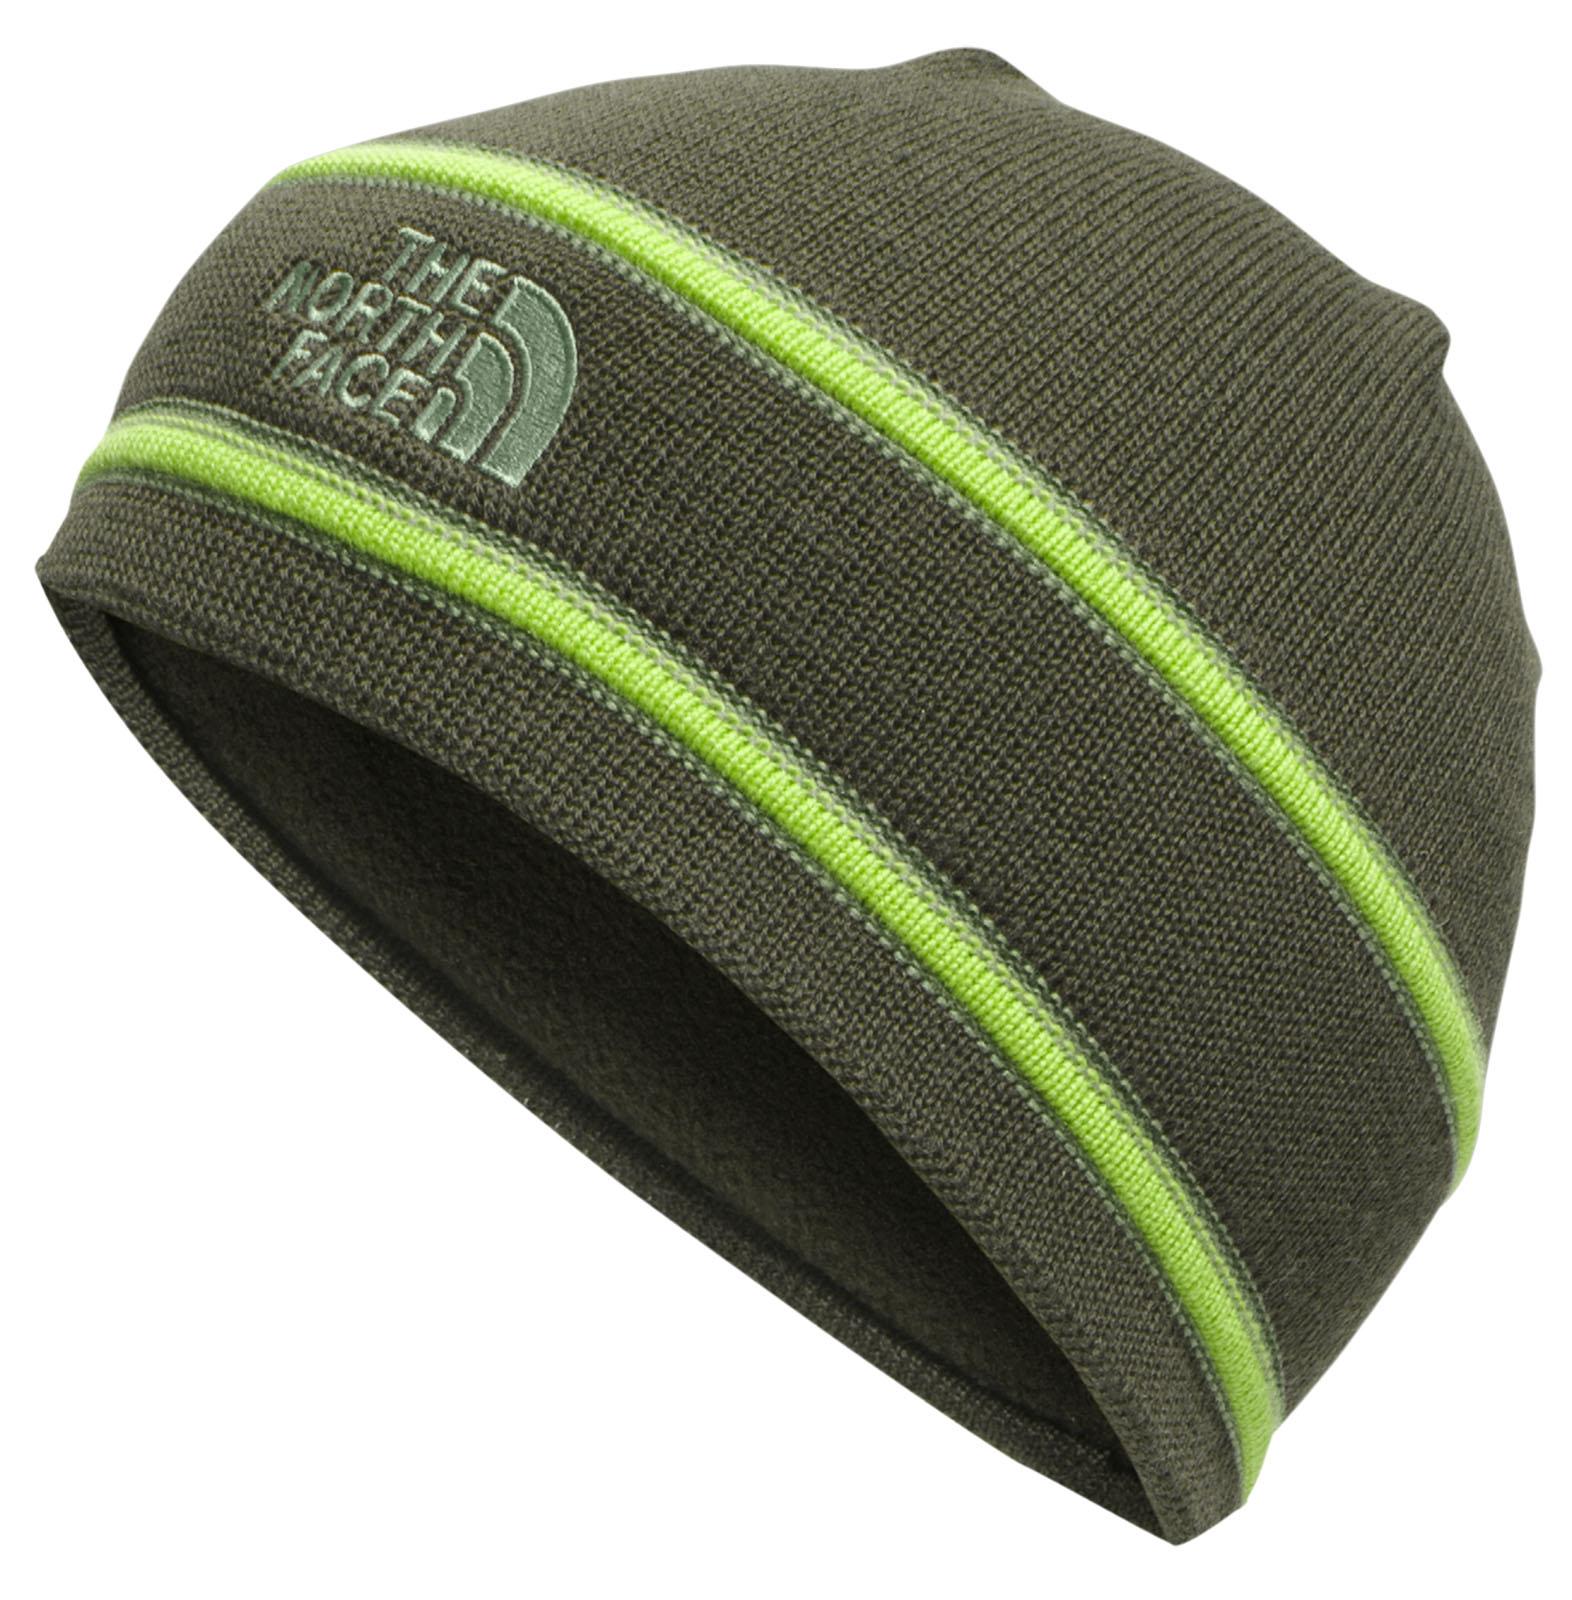 c13fc4cdeec The North Face Logo Beanie - Rosin Green  Duck Green  Neptune Diving   Ski